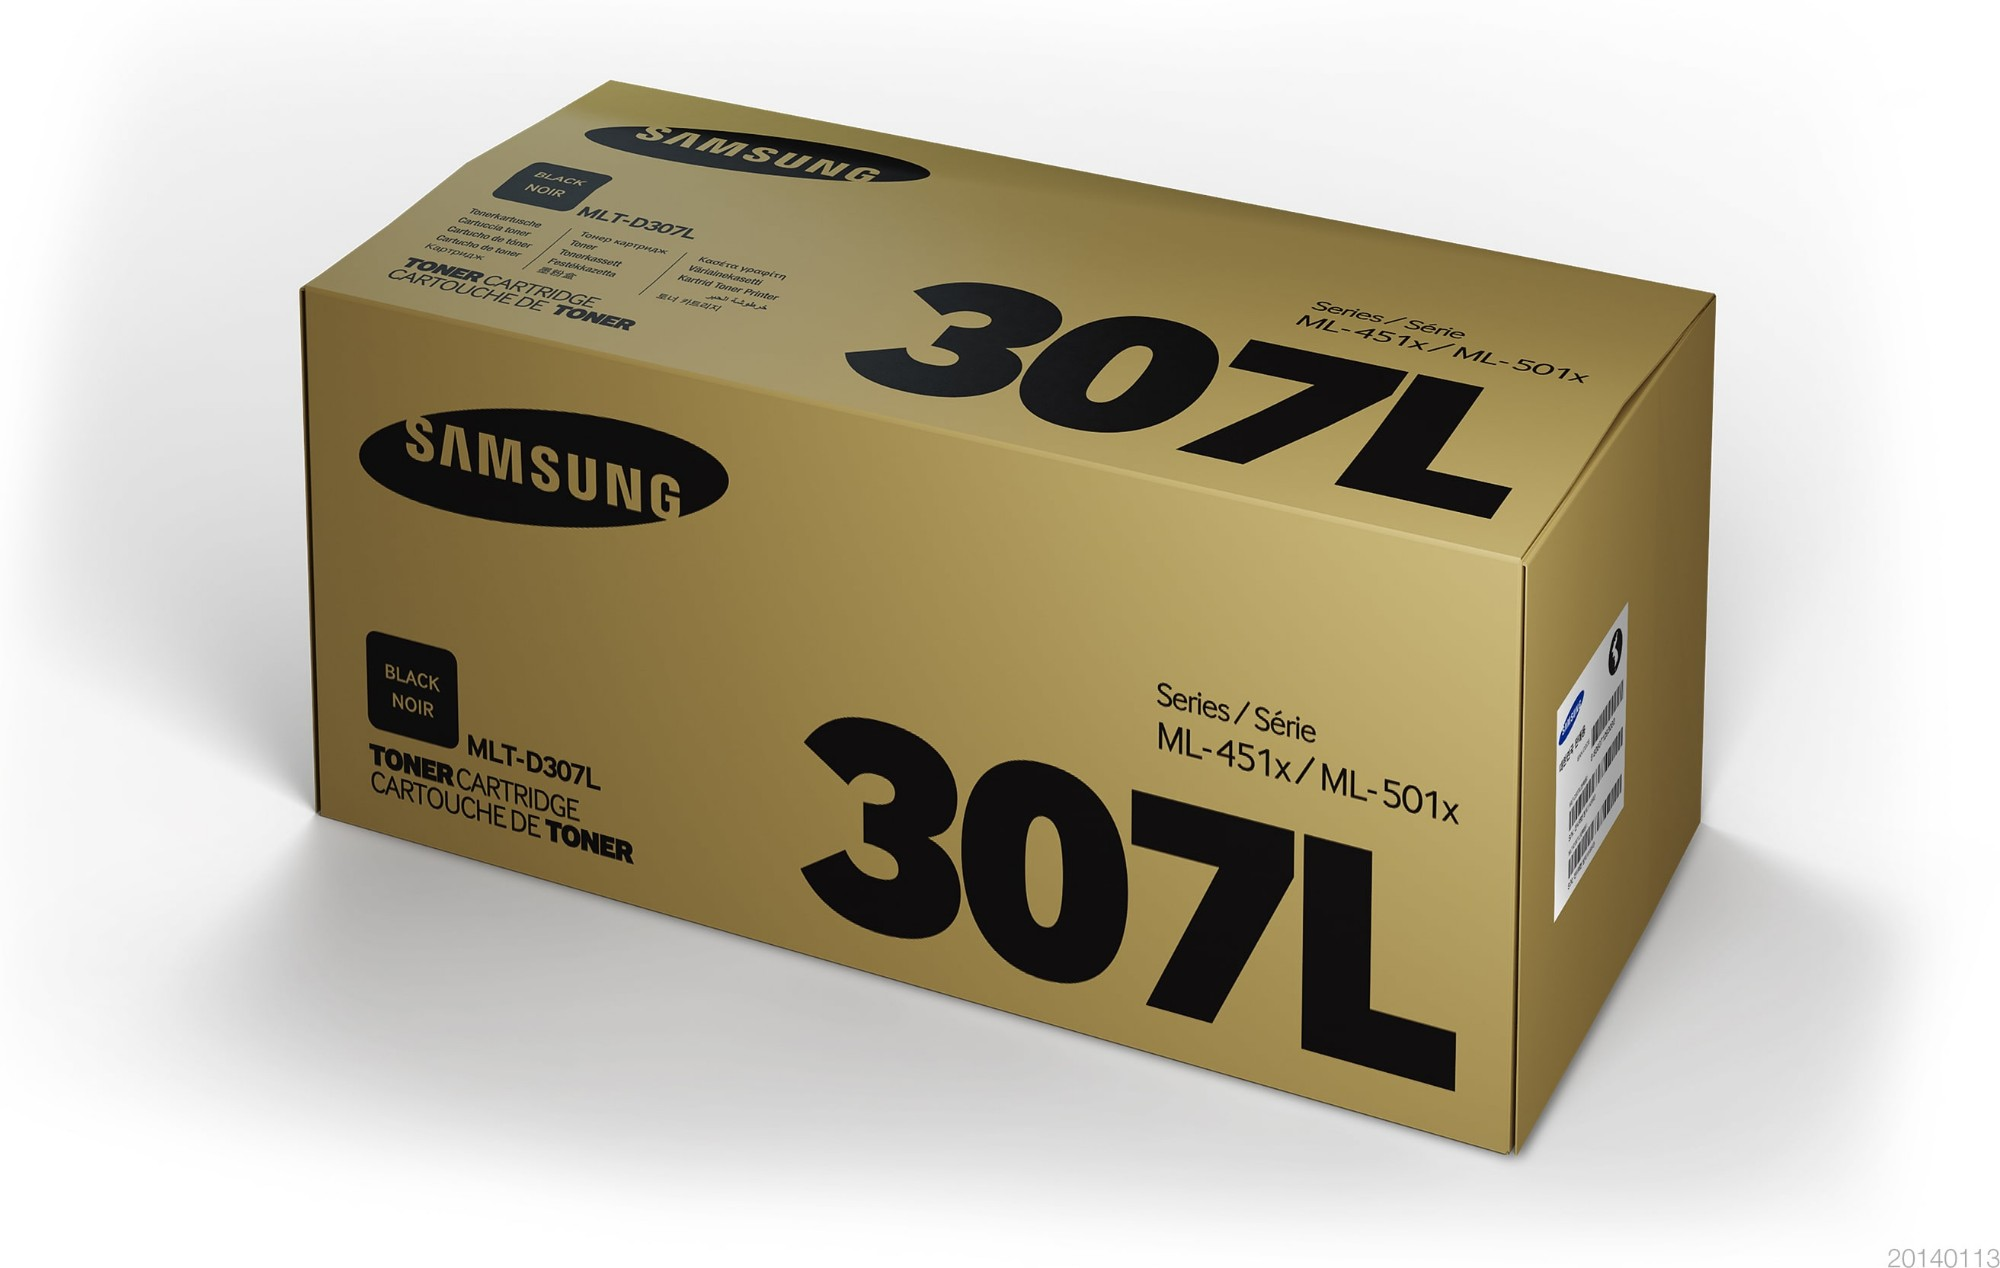 HP SV066A (MLT-D307L) Toner black, 15K pages